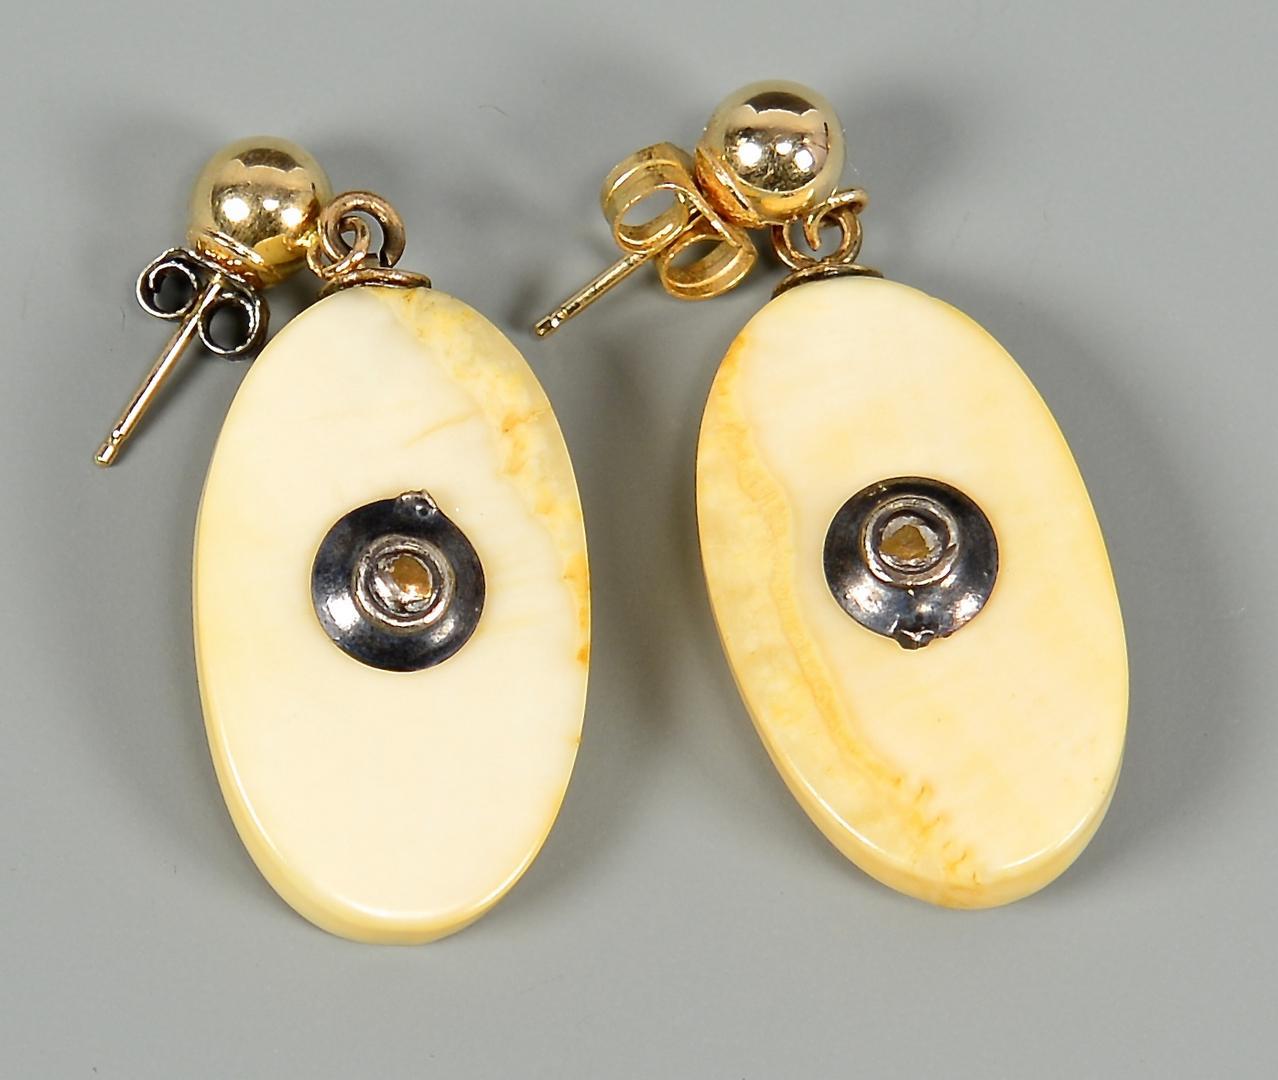 Igavel Auctions Alaskan Scrimshaw Ivory Amp Gold Nugget